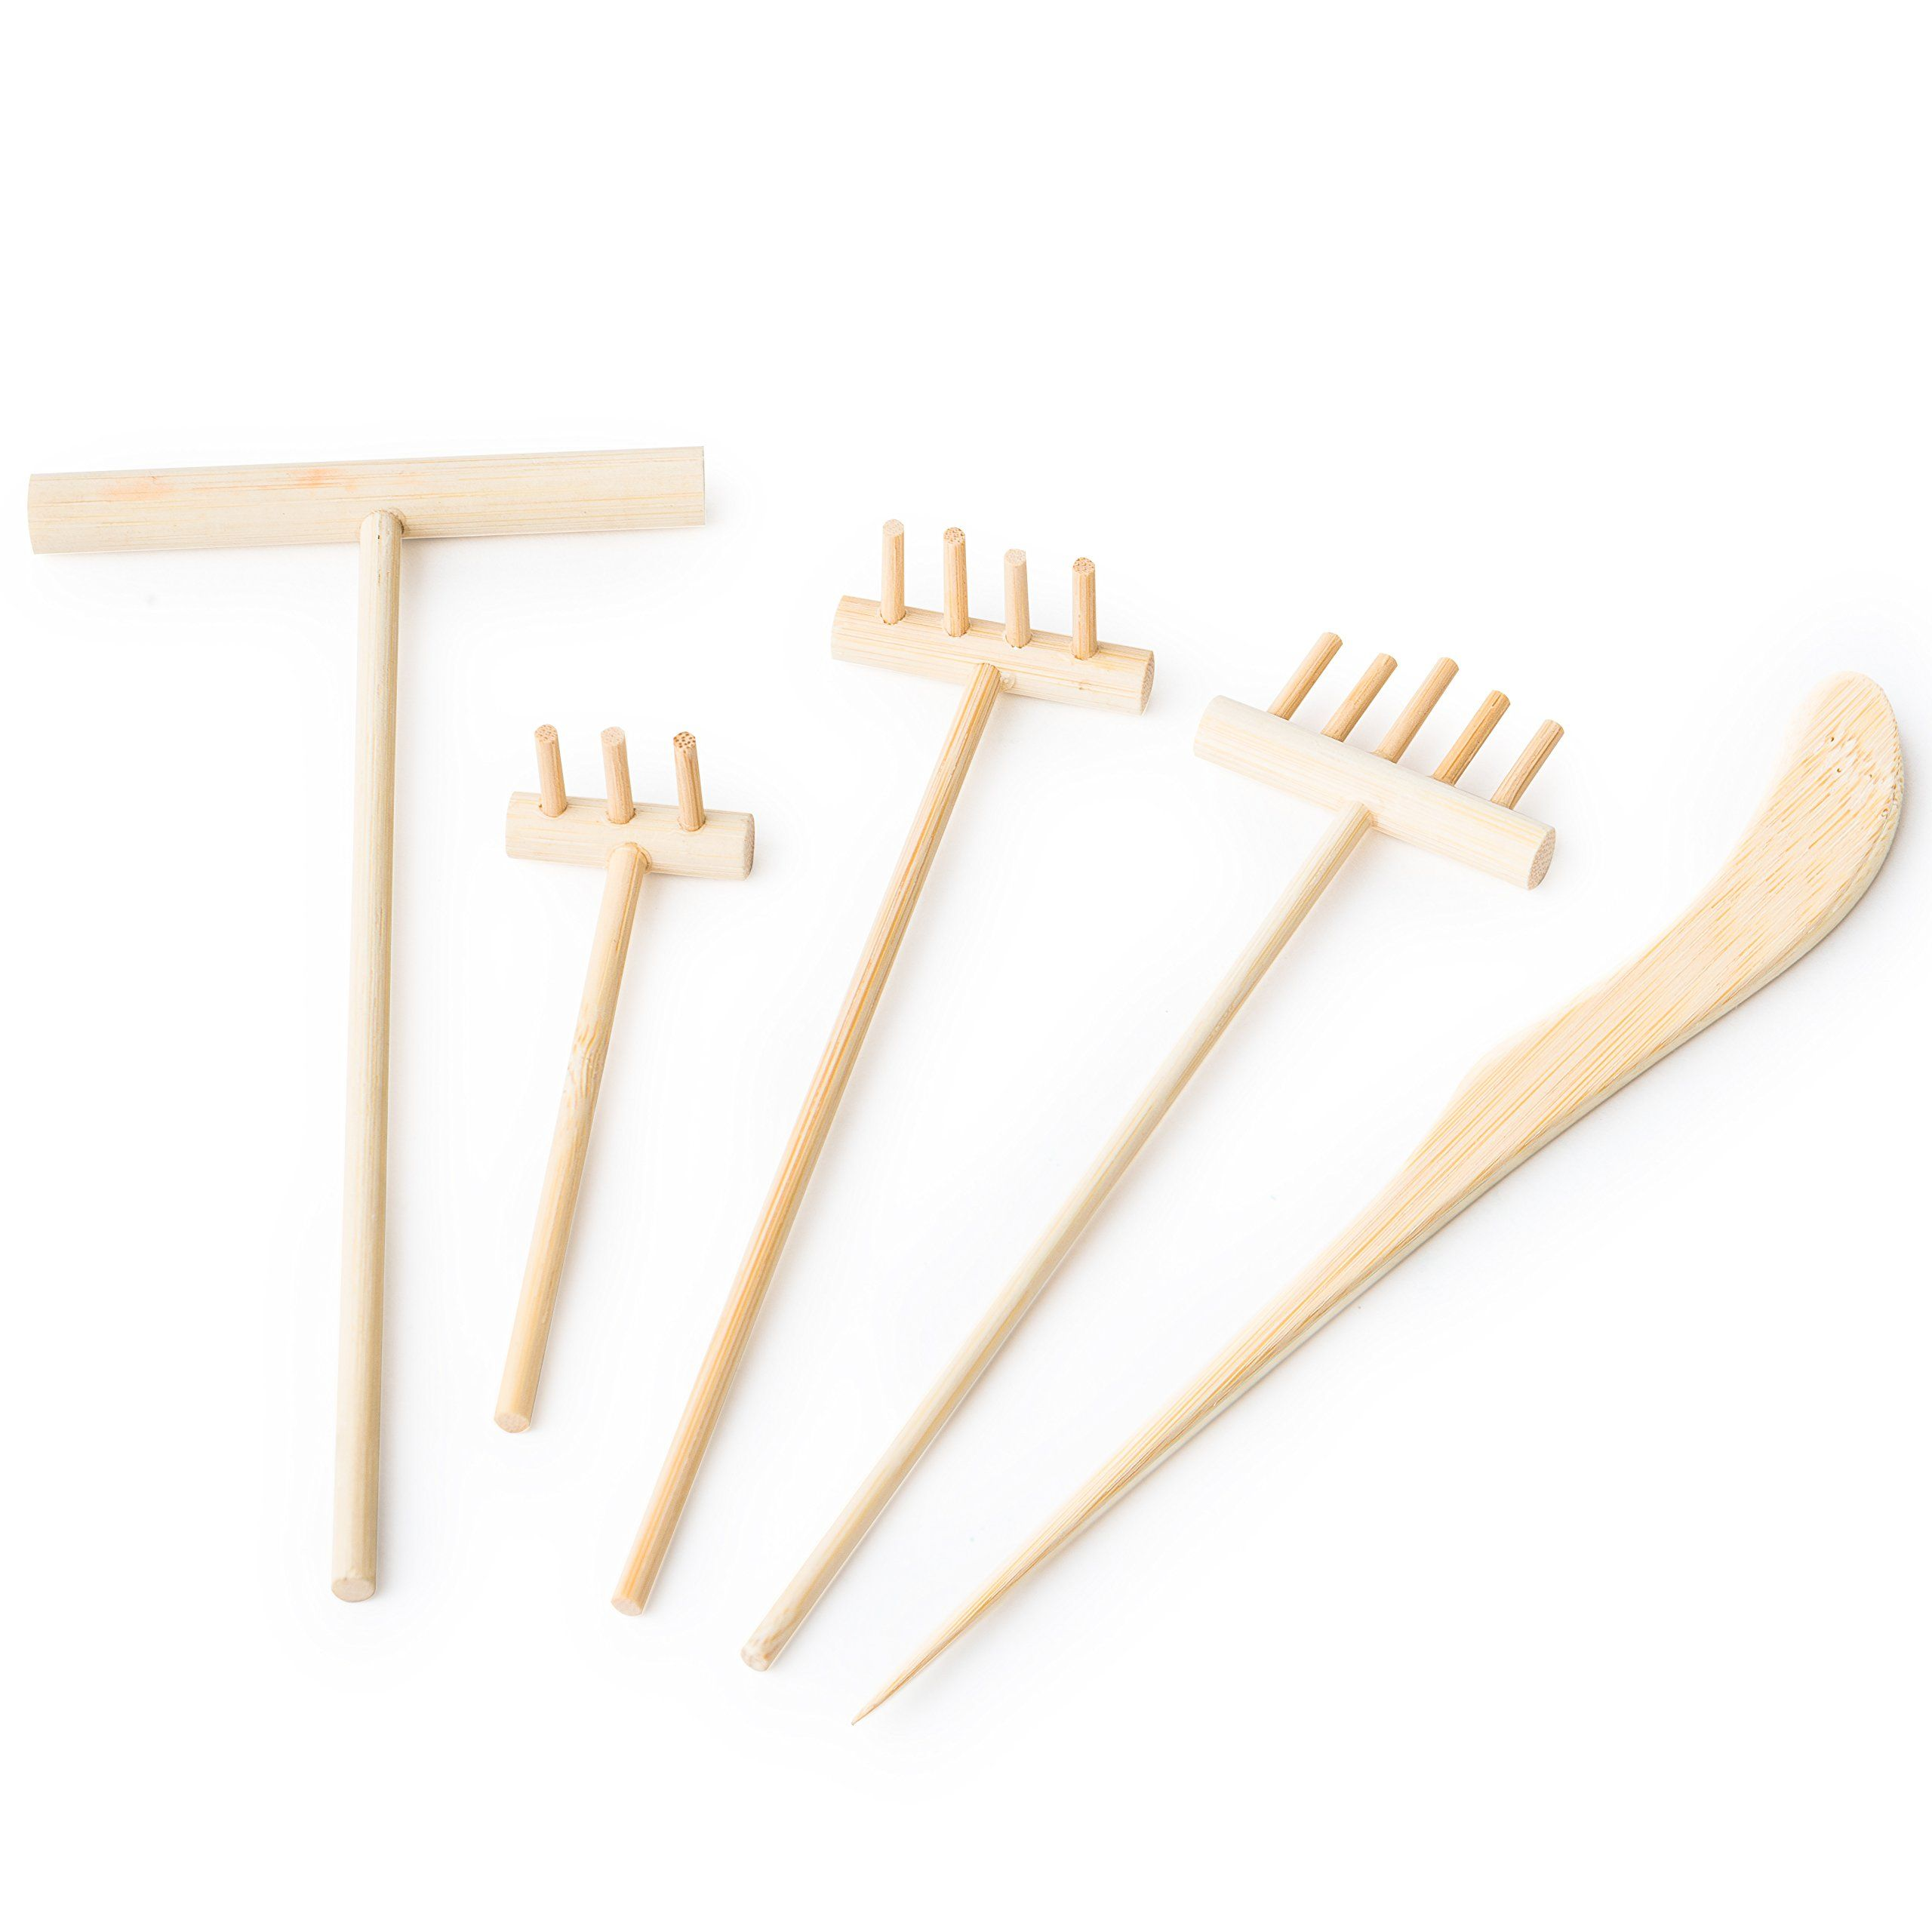 Mini zen garden rake set 5 small bamboo rakes for desktop or tabletop japanese sand garden - Zen garten miniatur set ...